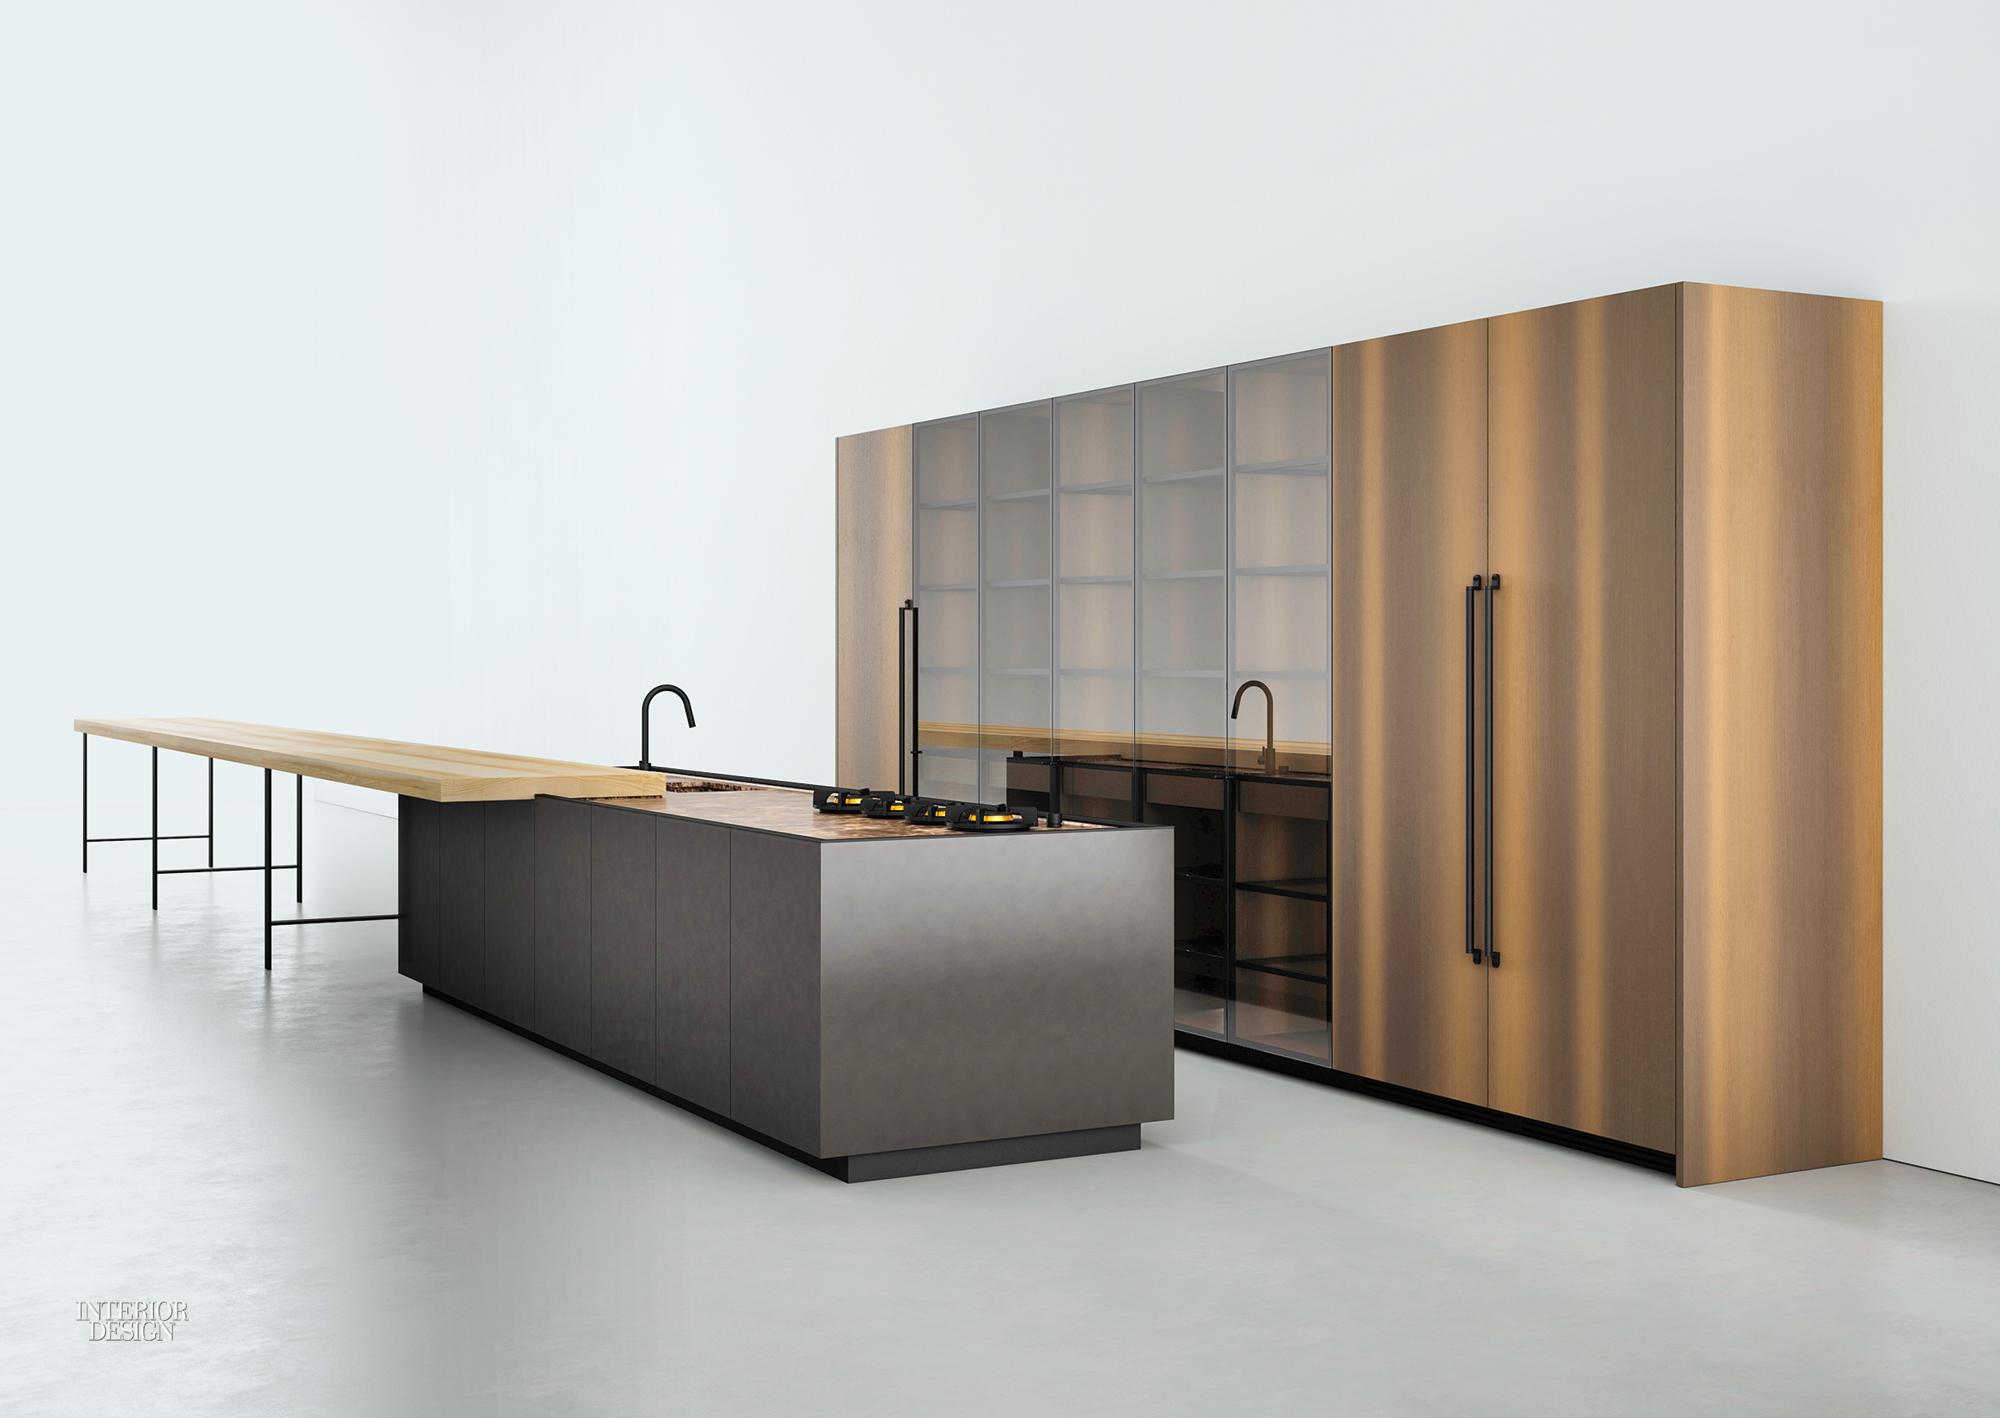 Charmant Norbert Wangenu0027s K21 Kitchen System For Boffi.